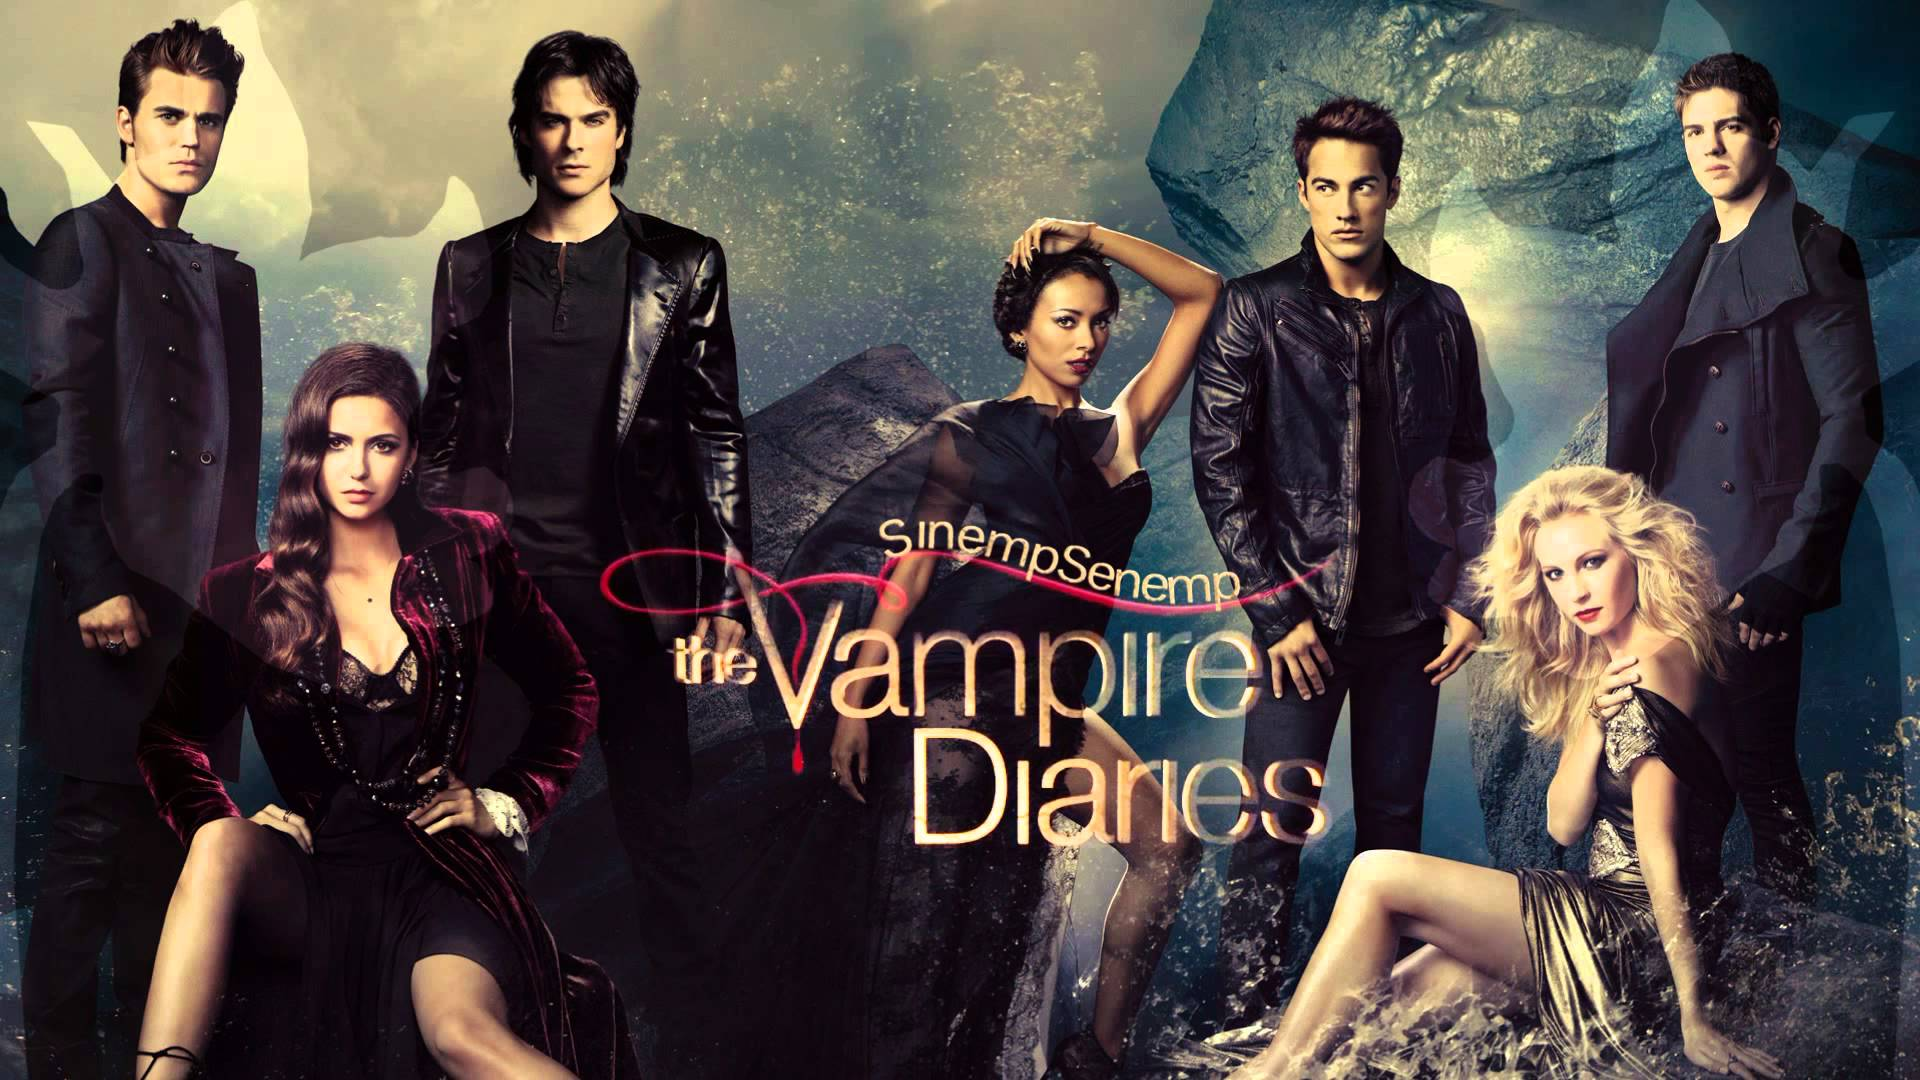 Bs To Vampire Diaries 6